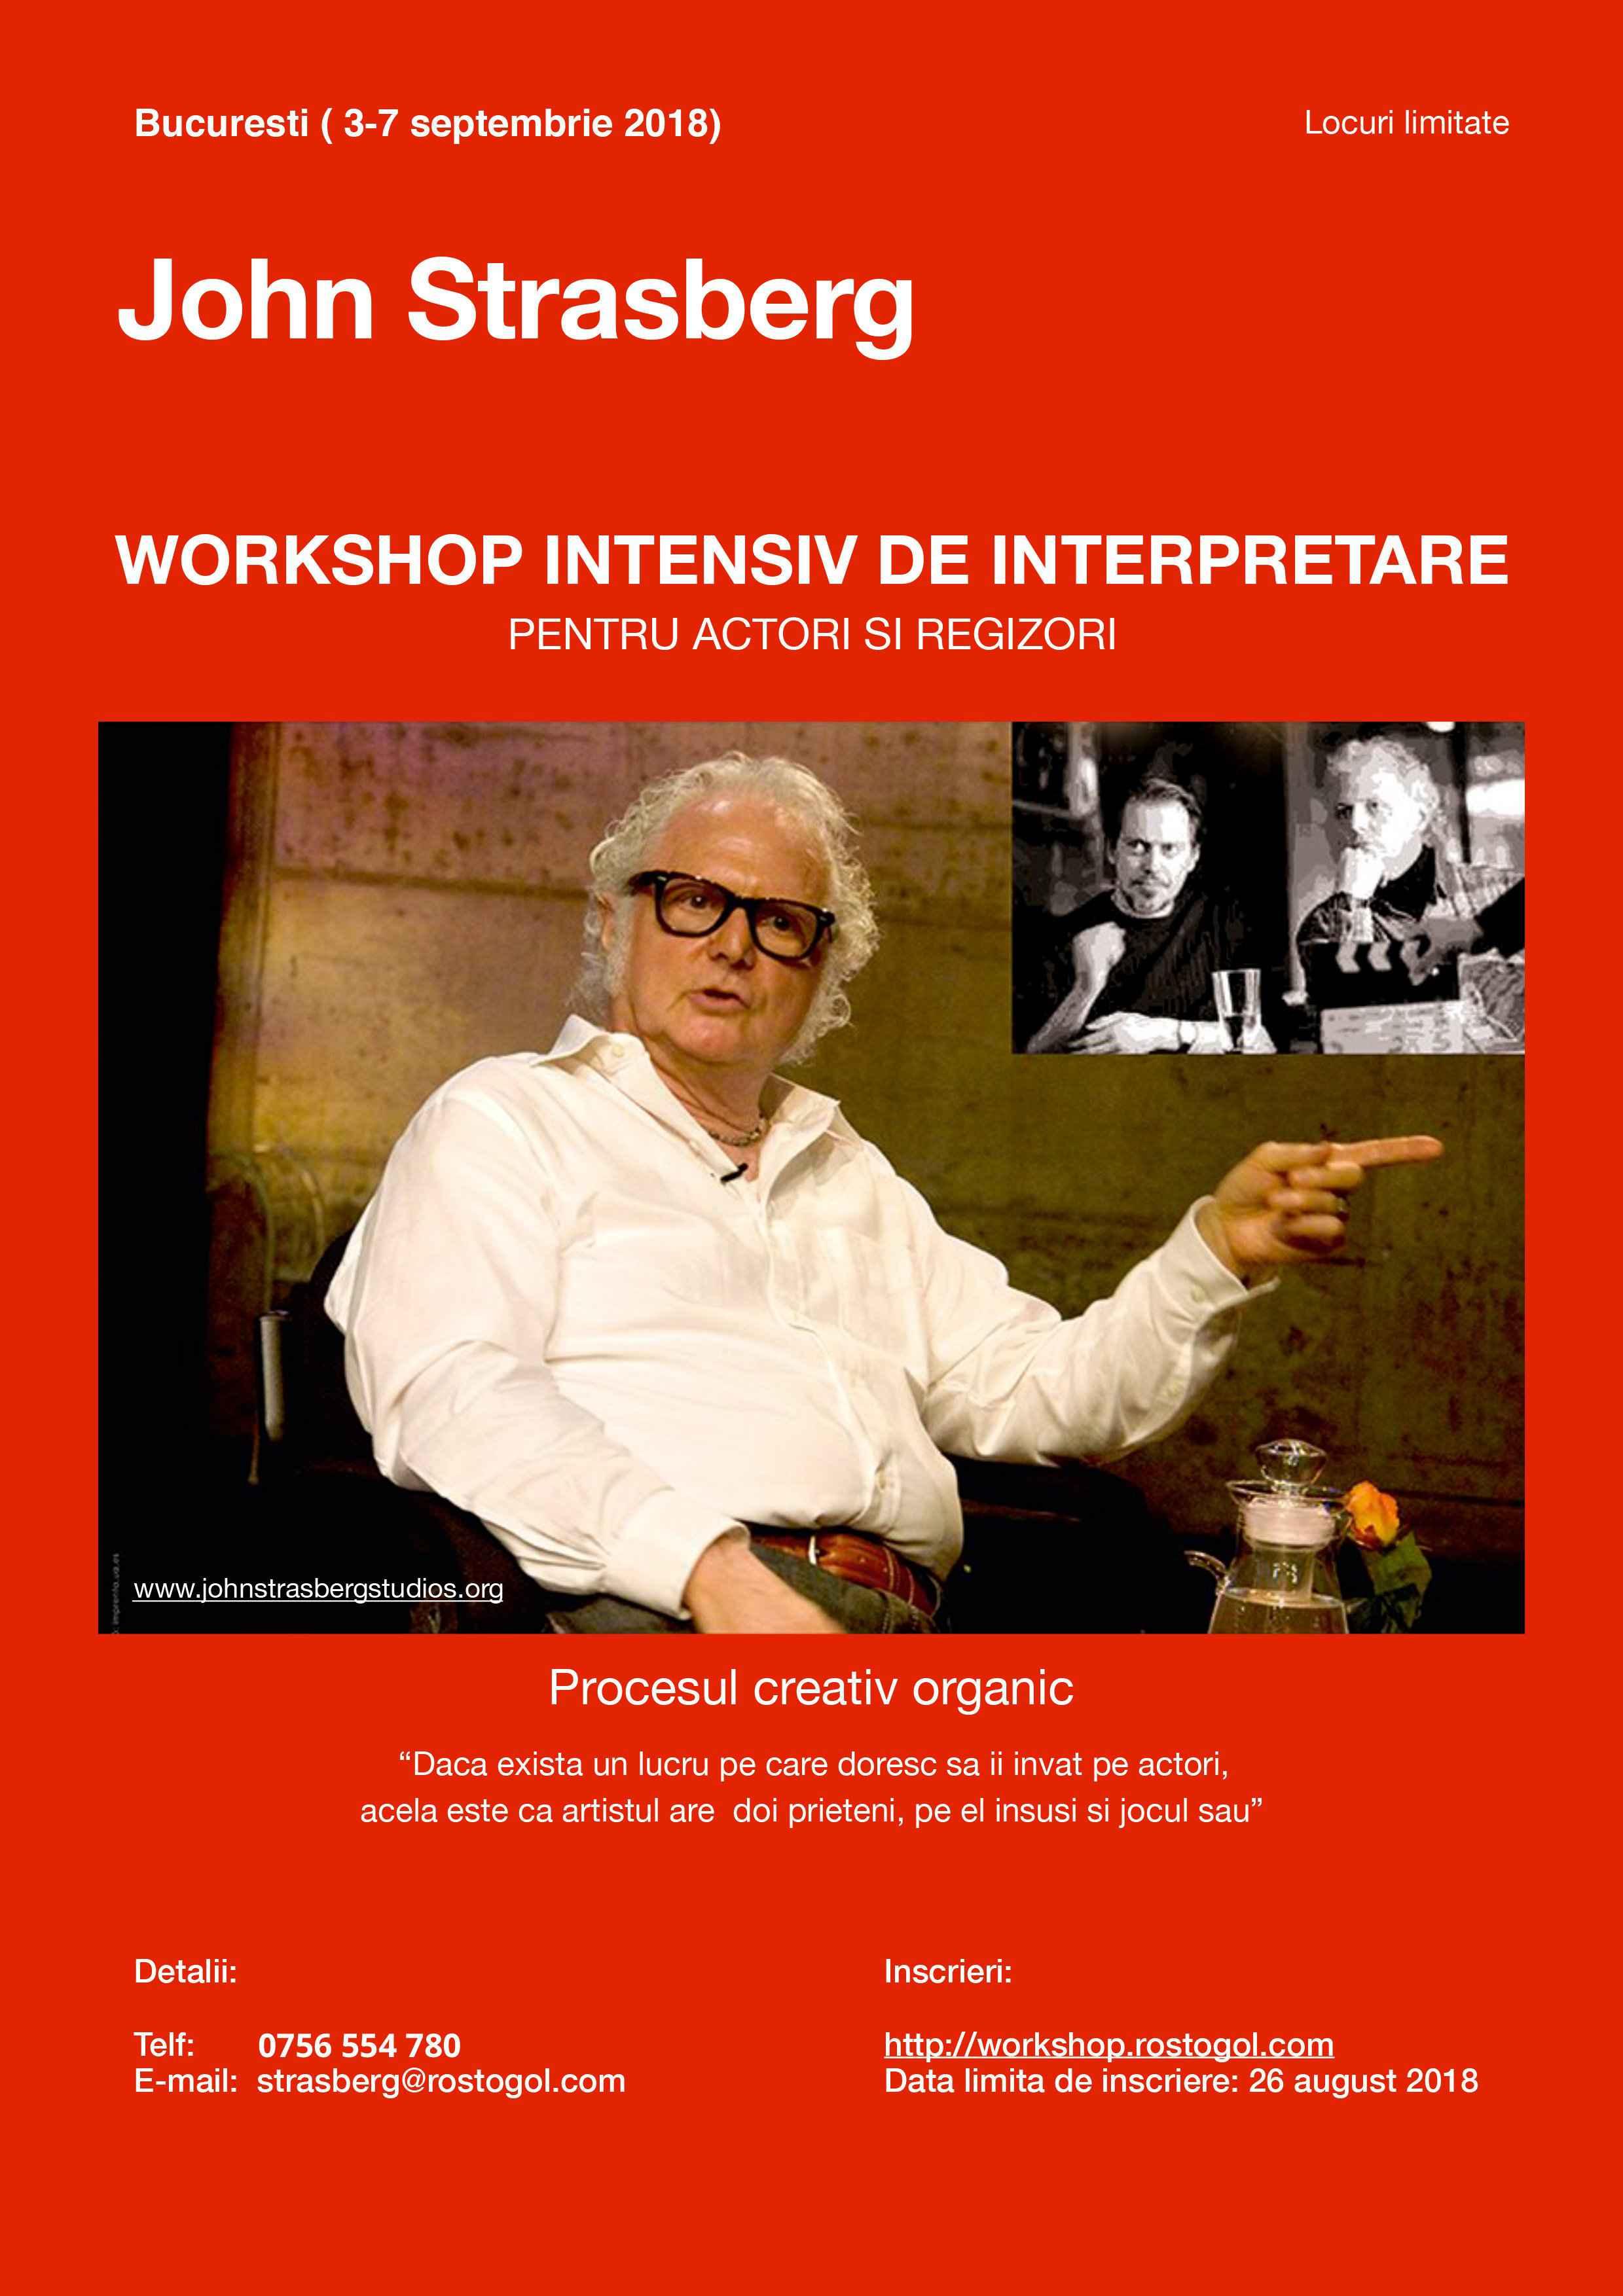 Workshop intensiv susținut de celebrul actor și regizor John Strasberg